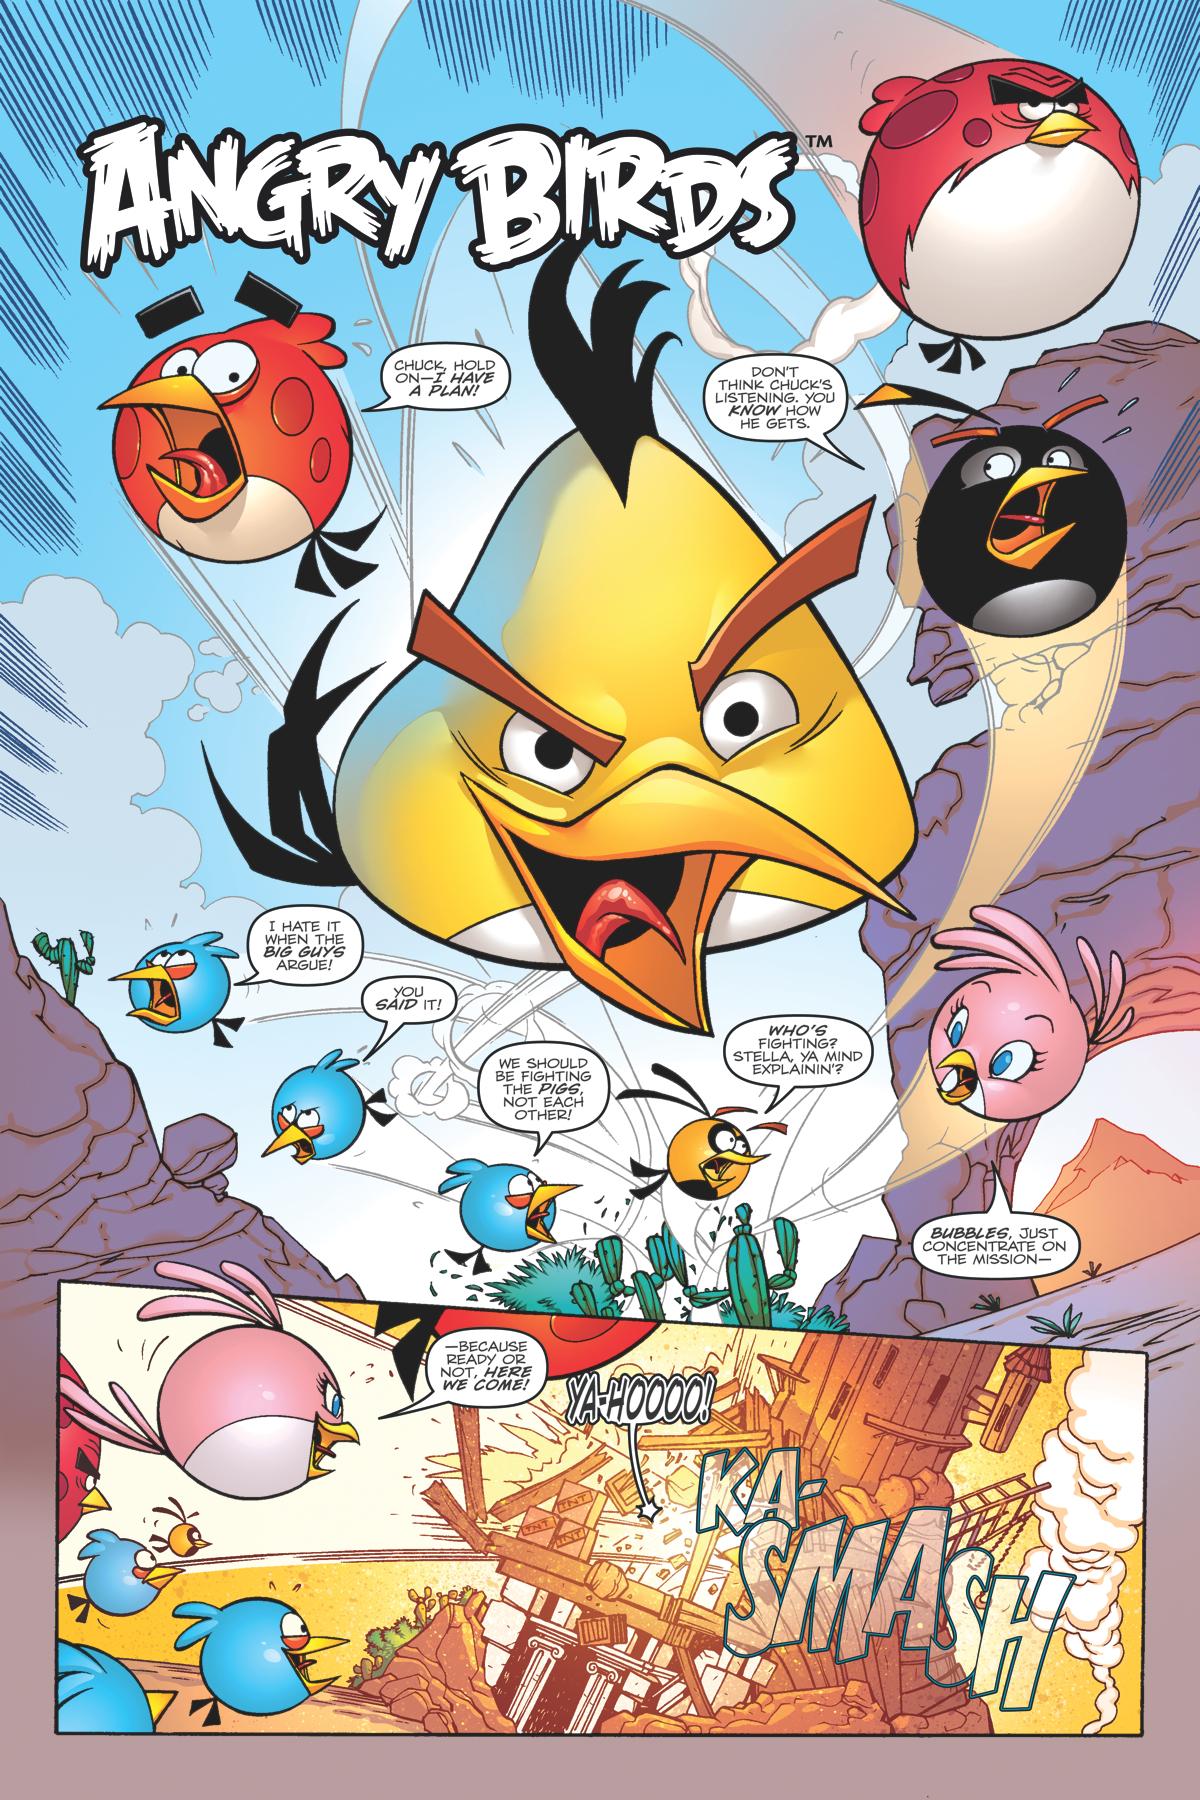 Transformers Windblade (2015) #1 - Transformers Comics - TFW2005